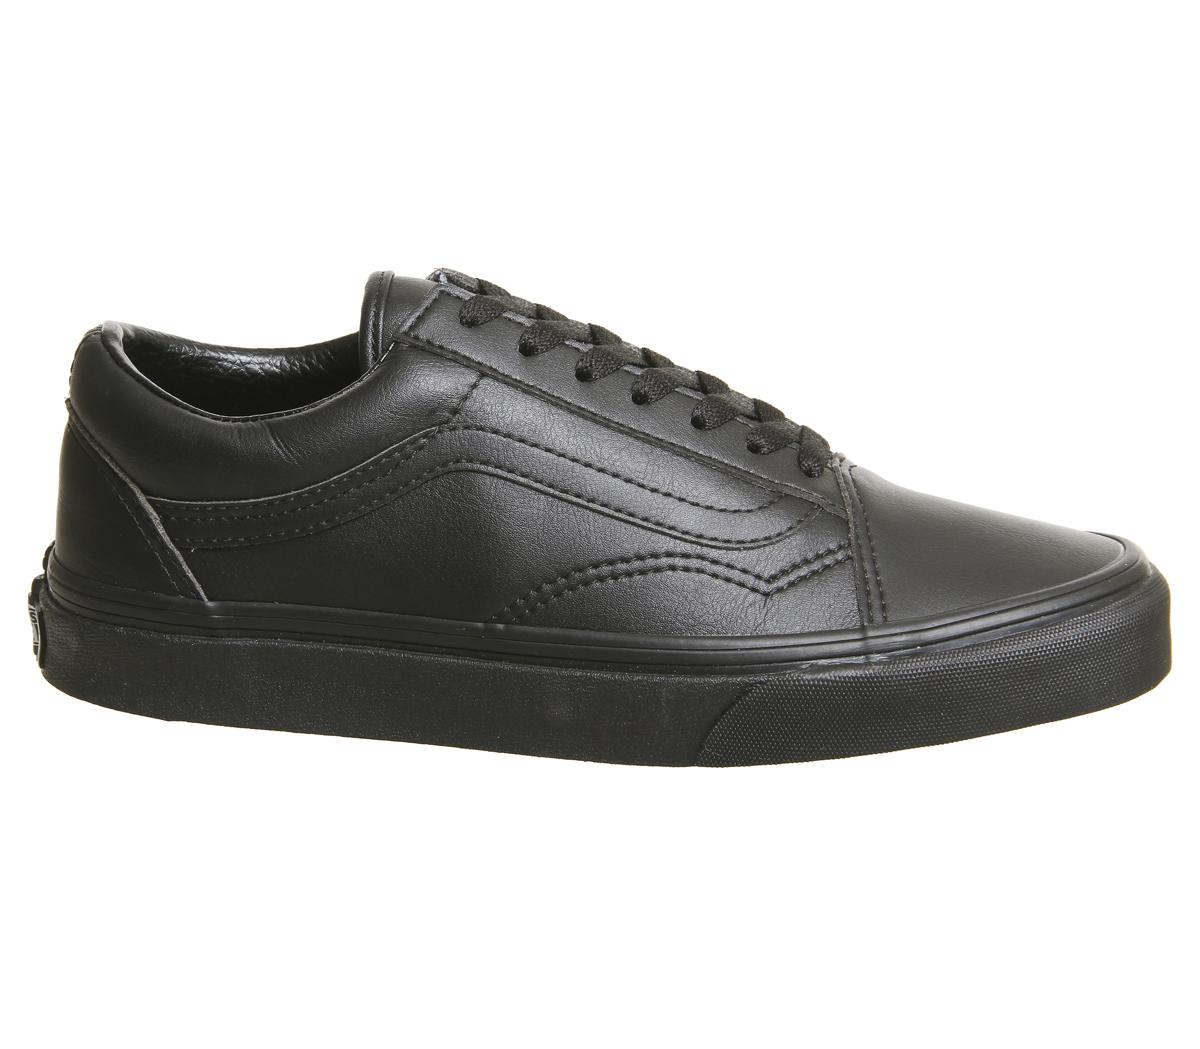 Sentinel Mens Vans Old Skool Trainers BLACK BLACK MONO LEATHER Trainers  Shoes 1d08c279fb6